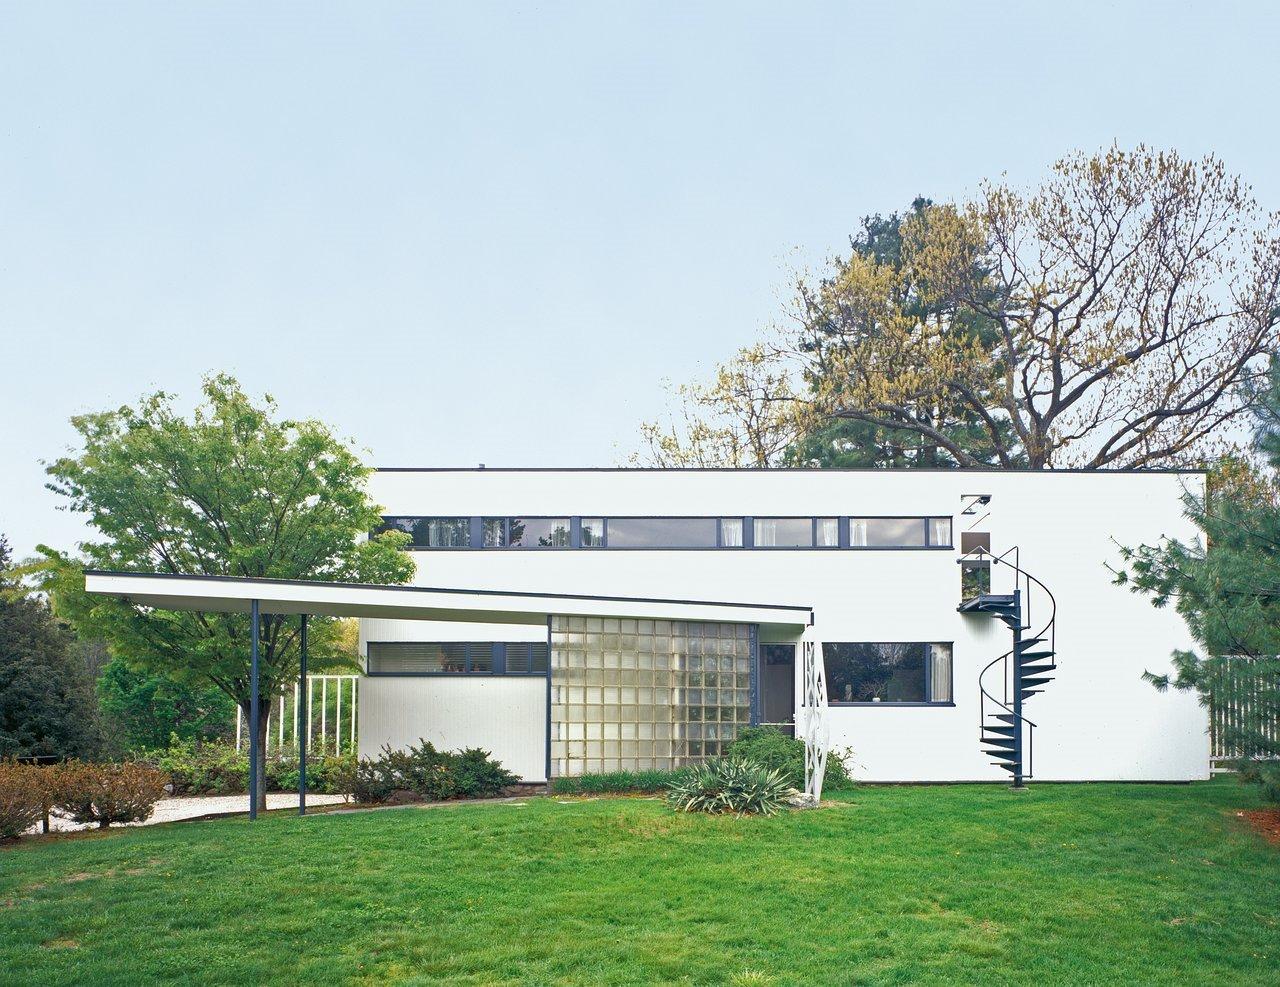 1938 Gropius House